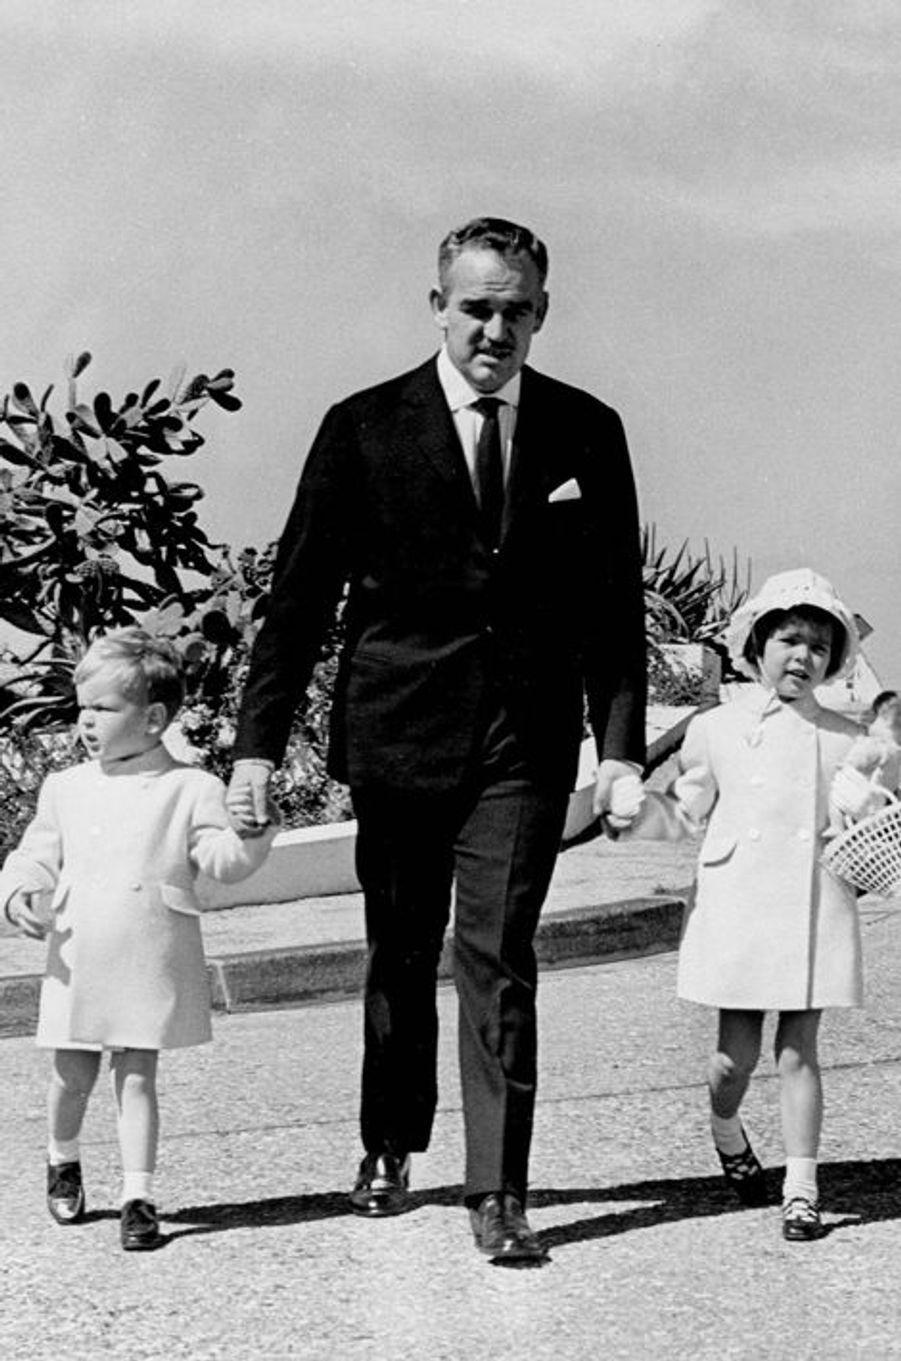 Le prince Rainier III de Monaco avec le prince Albert et la princesse Caroline, le 12 avril 1961